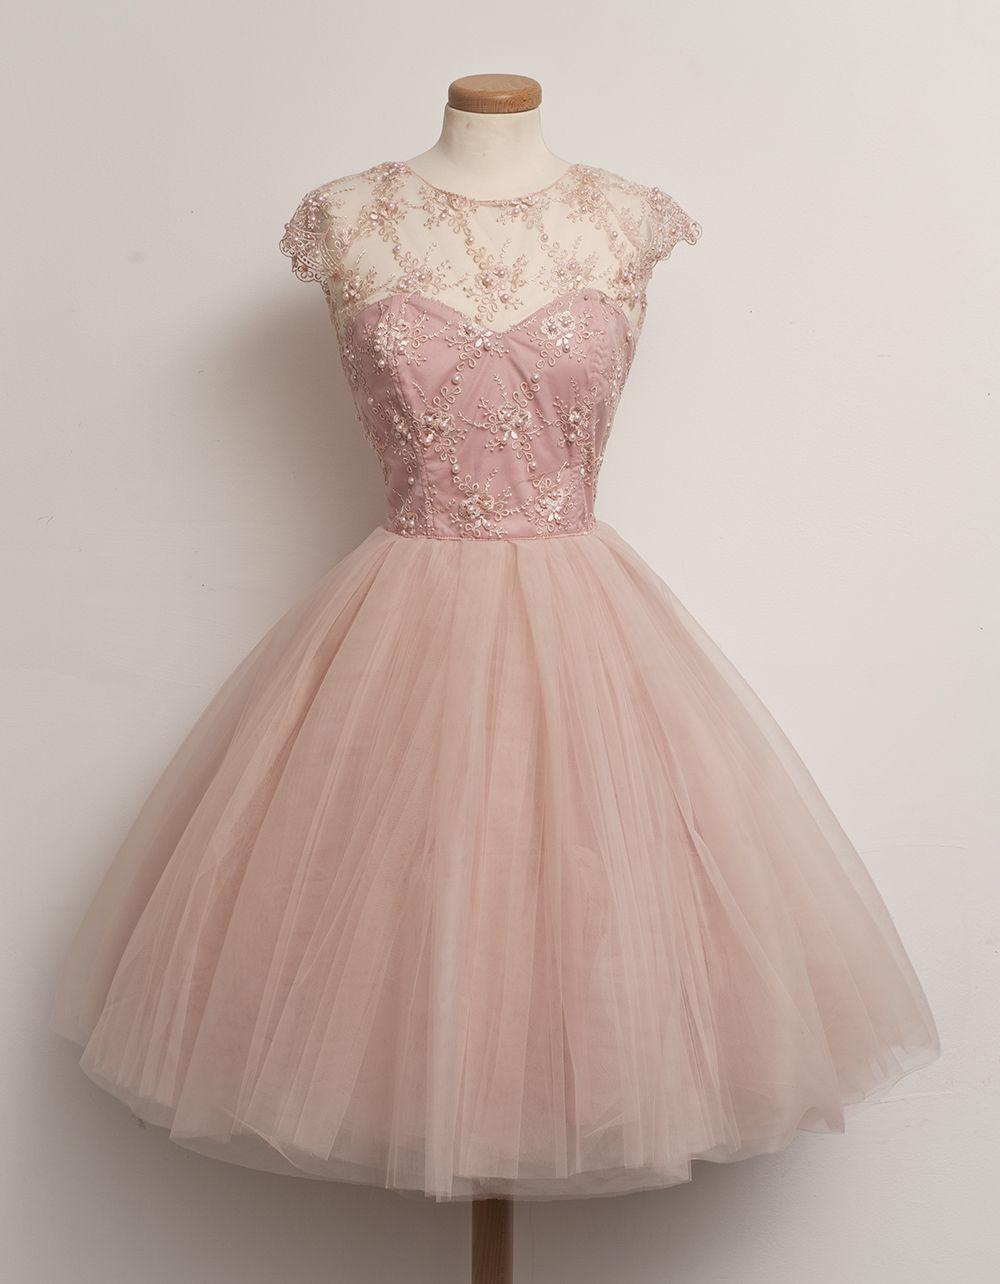 Chotronette photo vintage dresses pinterest vintage dresses